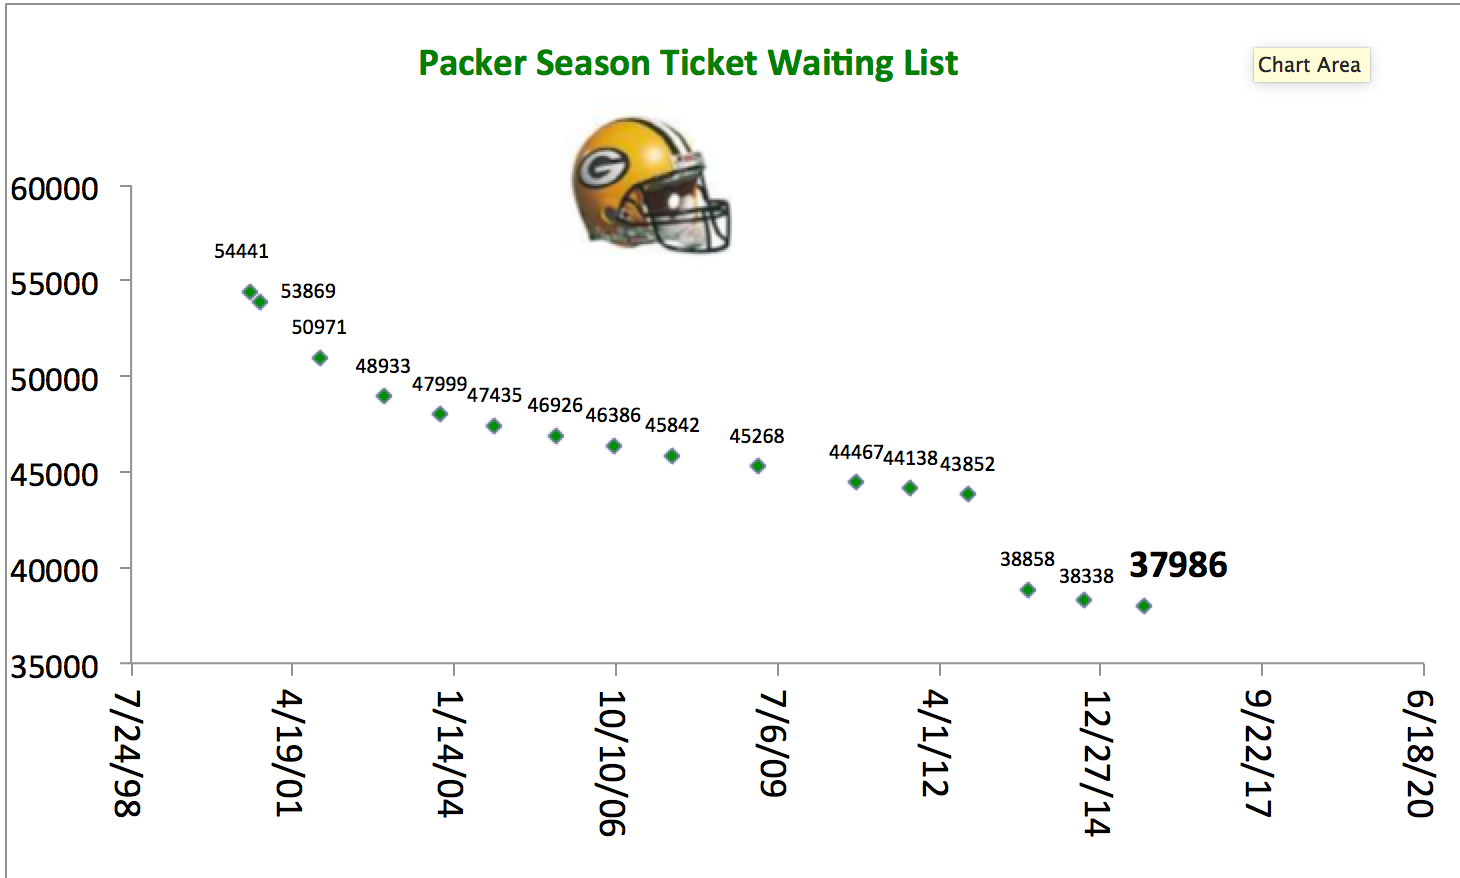 2015 Packer Season Ticket Graph